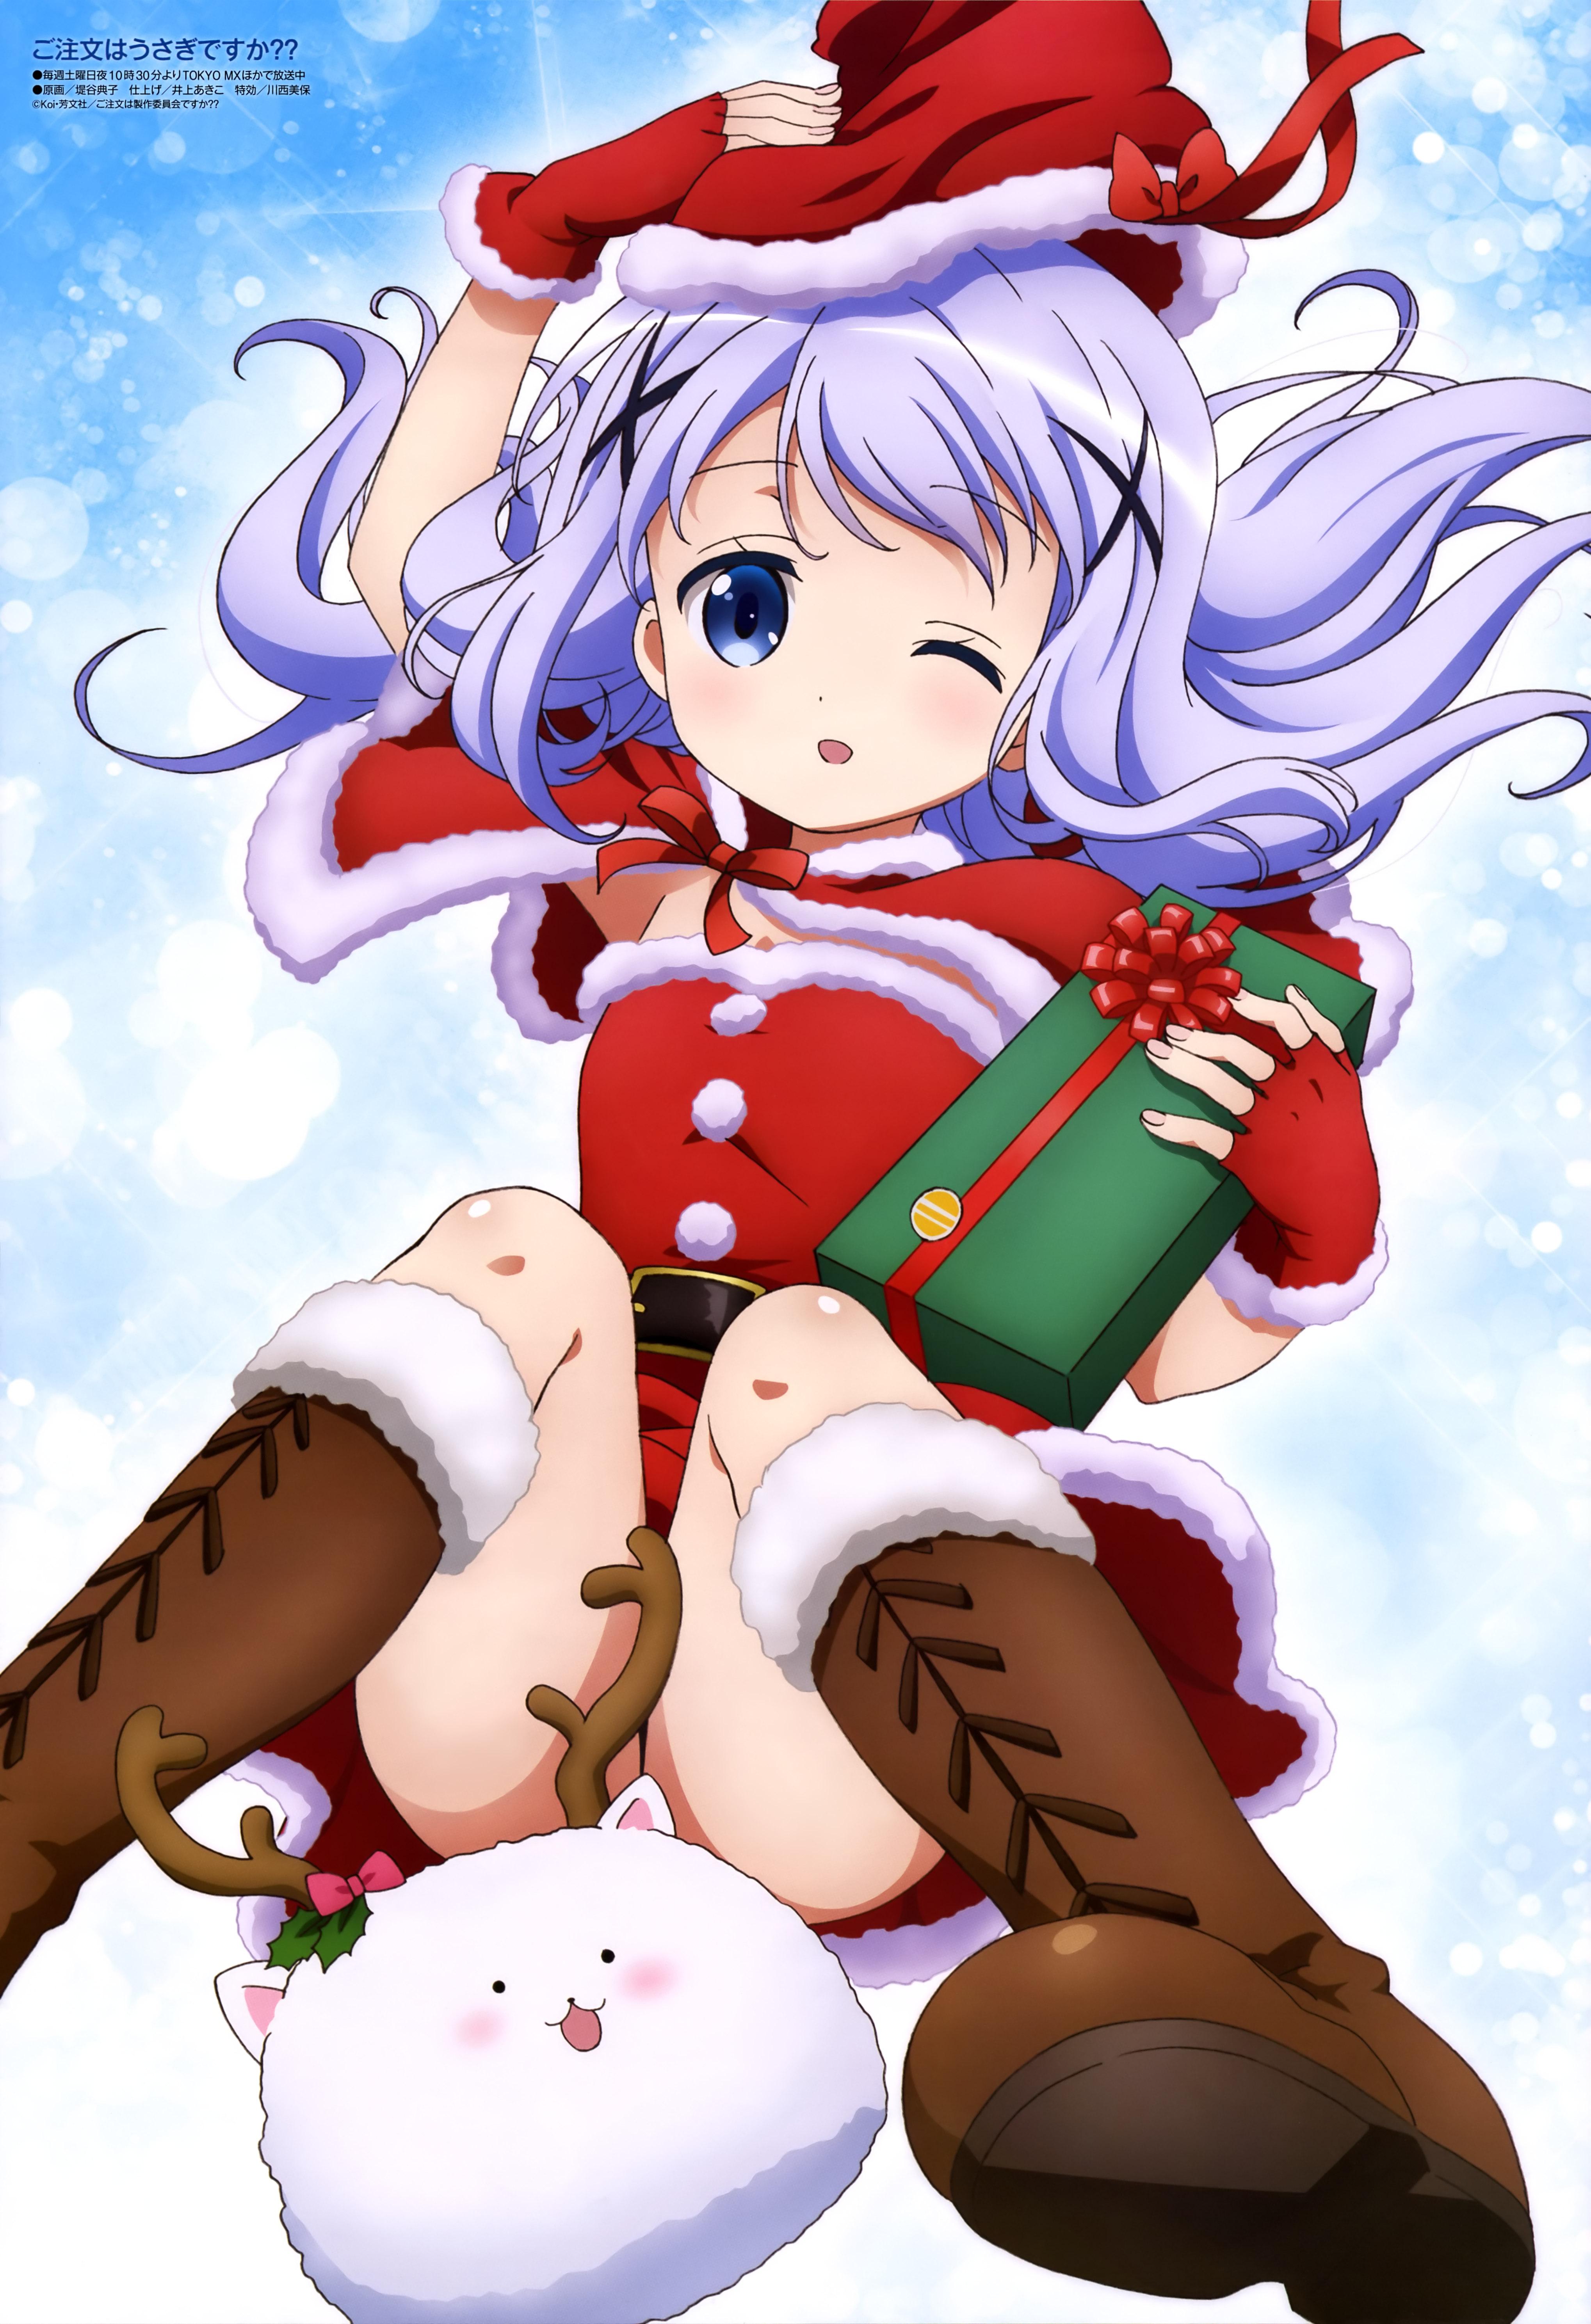 Animedia-Magazine-December-2015-anime-gochuumon wa usagi desu ka